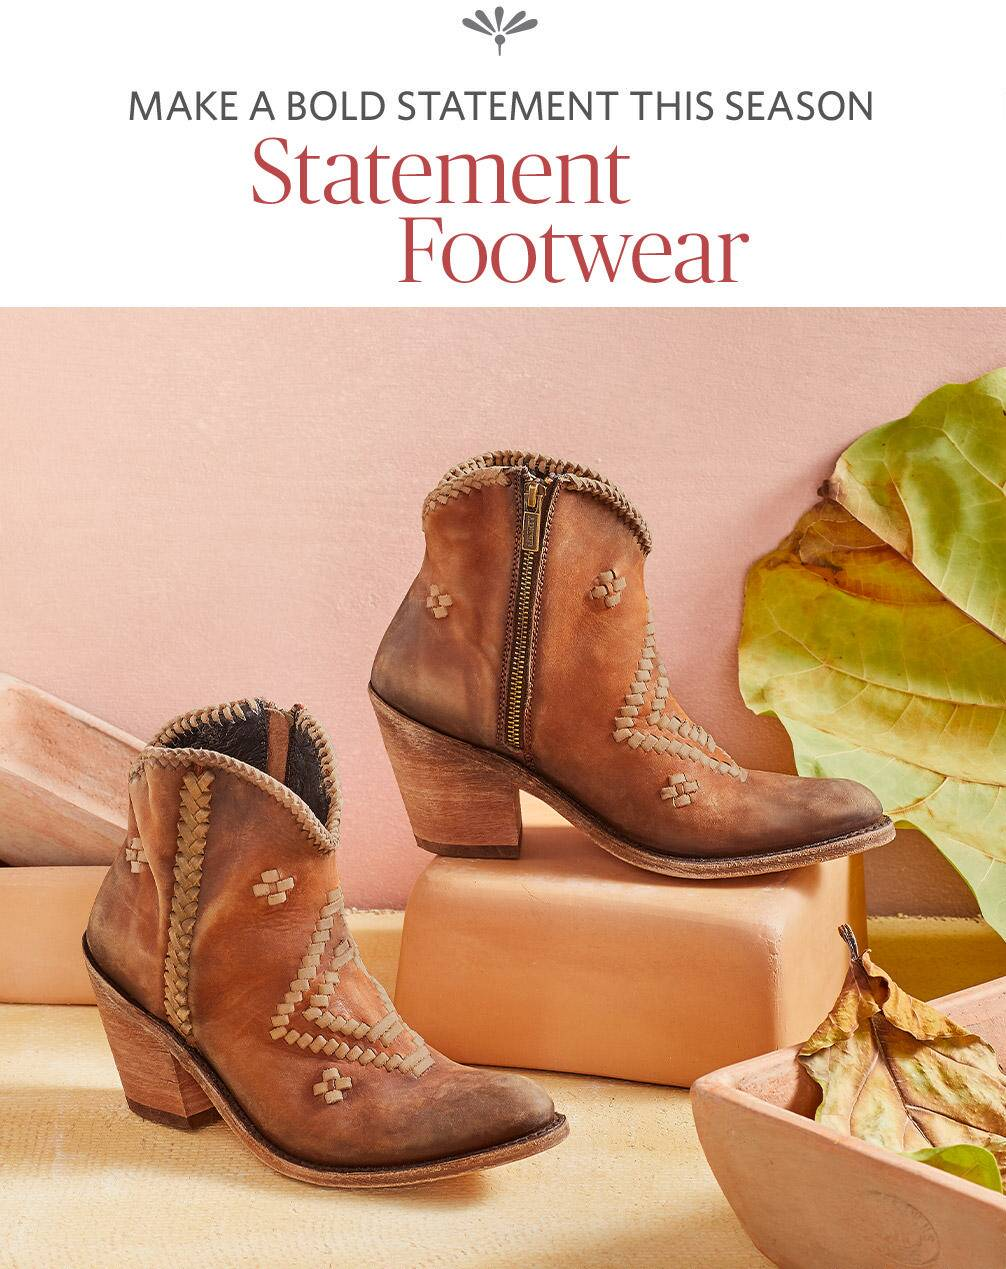 Statement Footwear